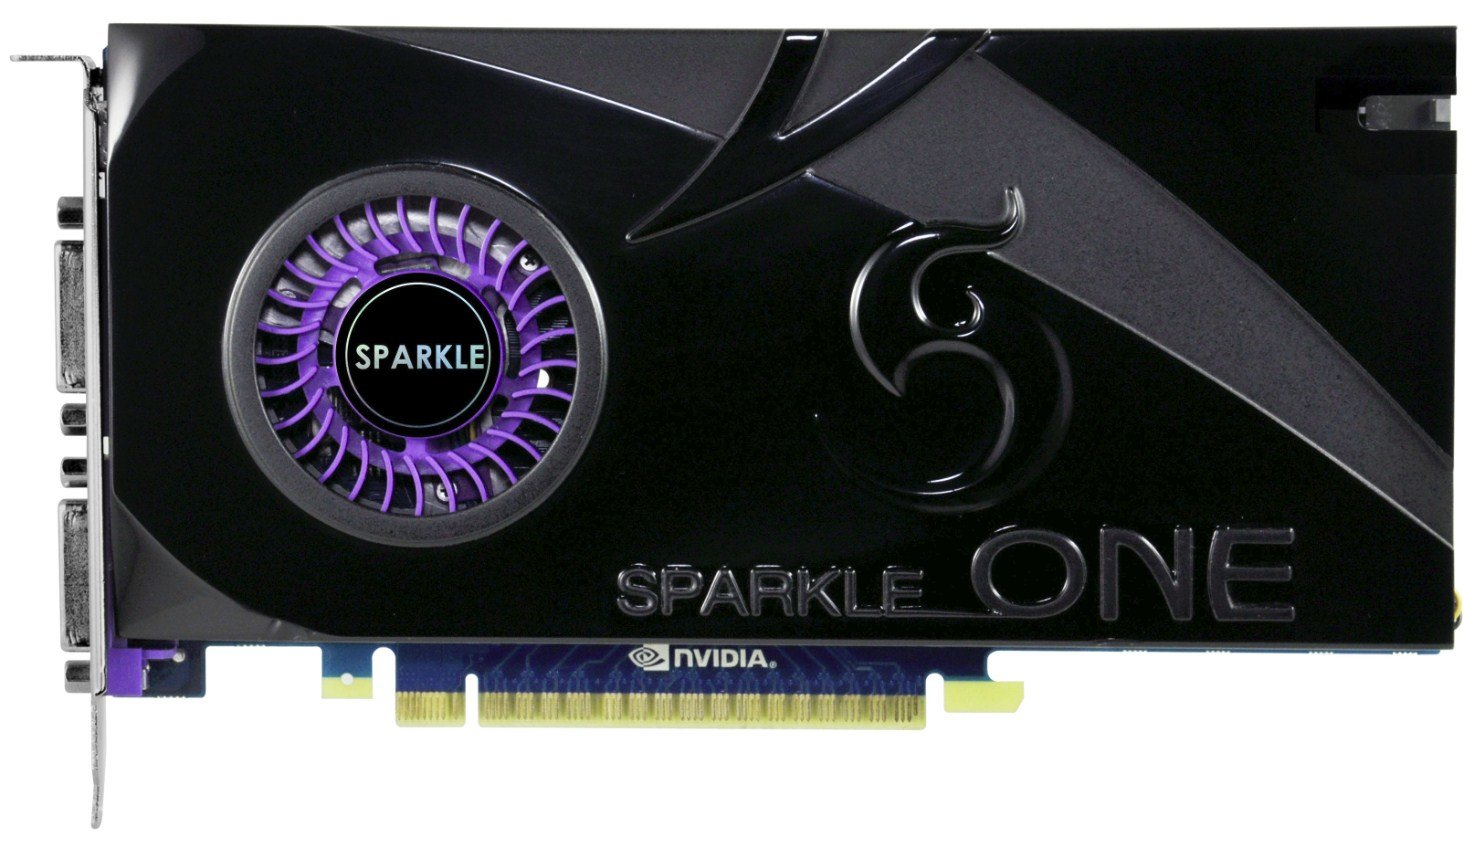 Sparkle One GeForce GTS 450